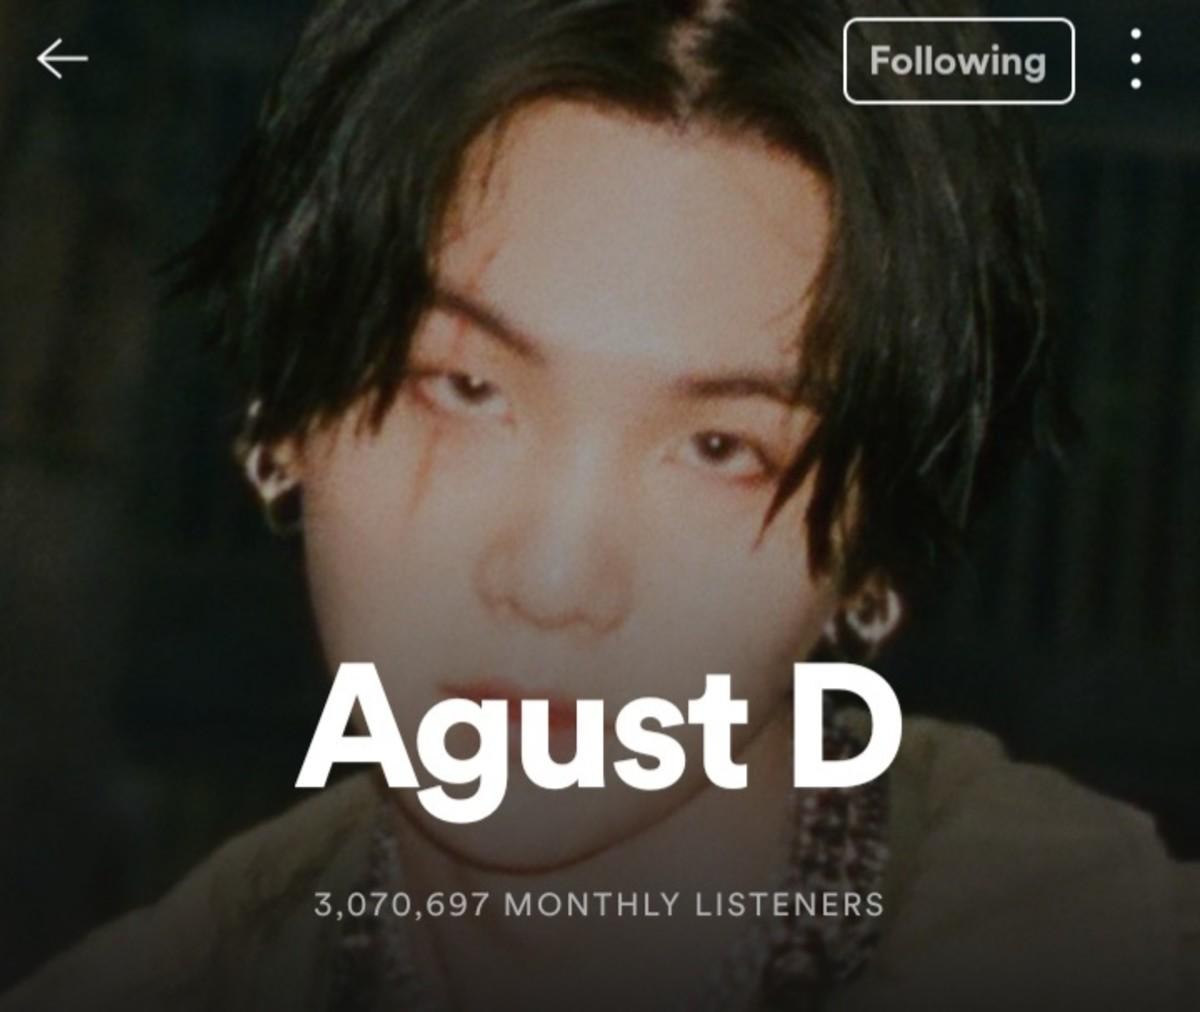 Agust D Spotify